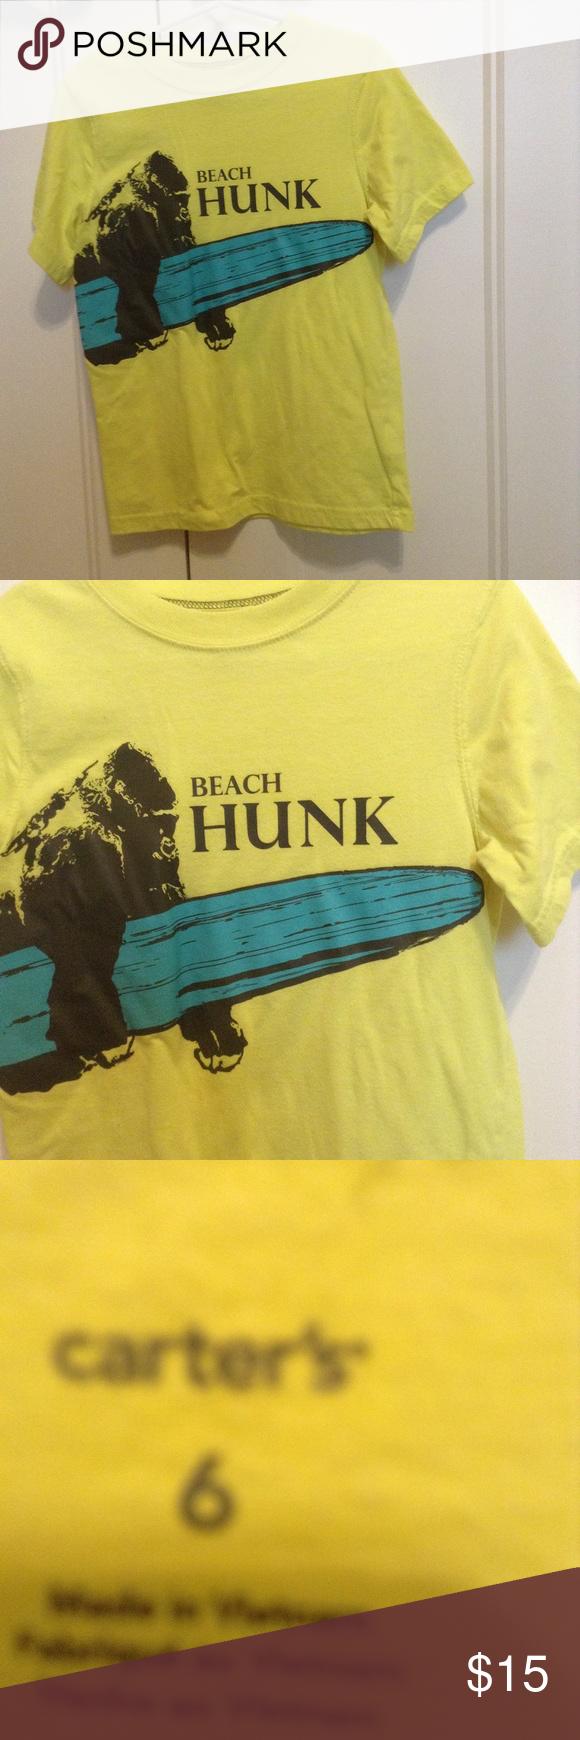 Carters Boys Size 6 Beach Hunk T